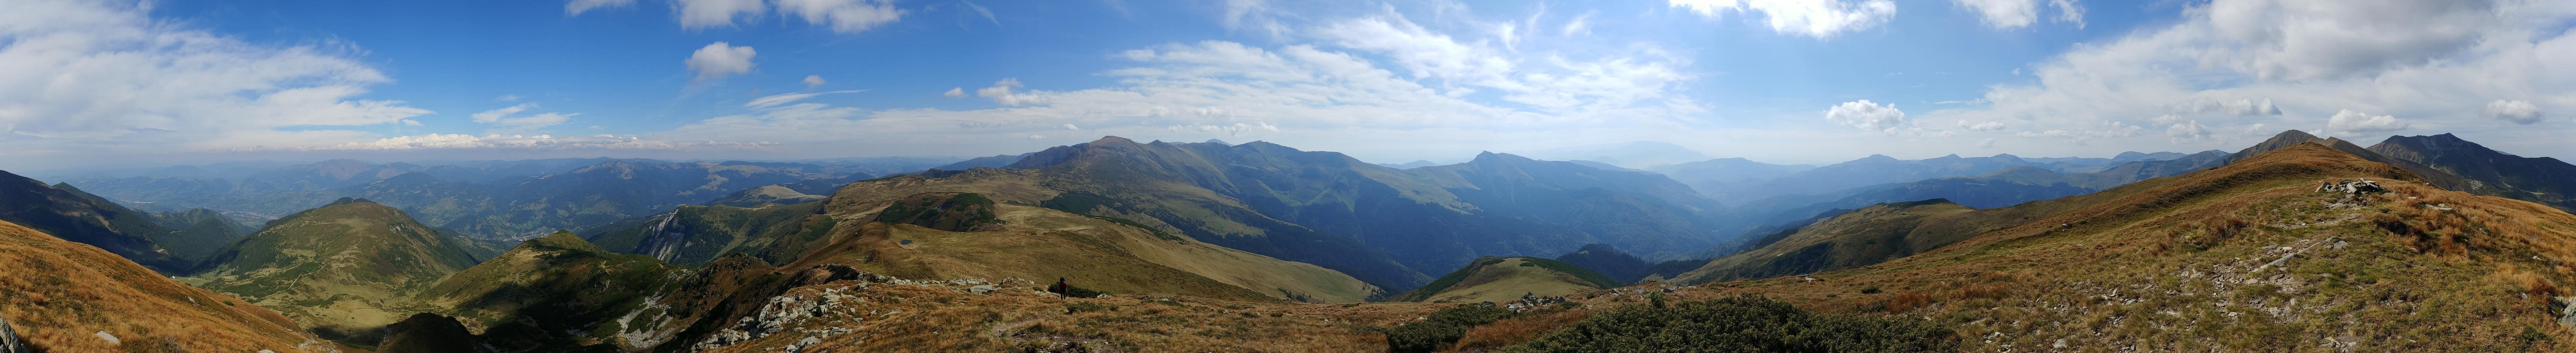 Paisaje montañoso en panorámica